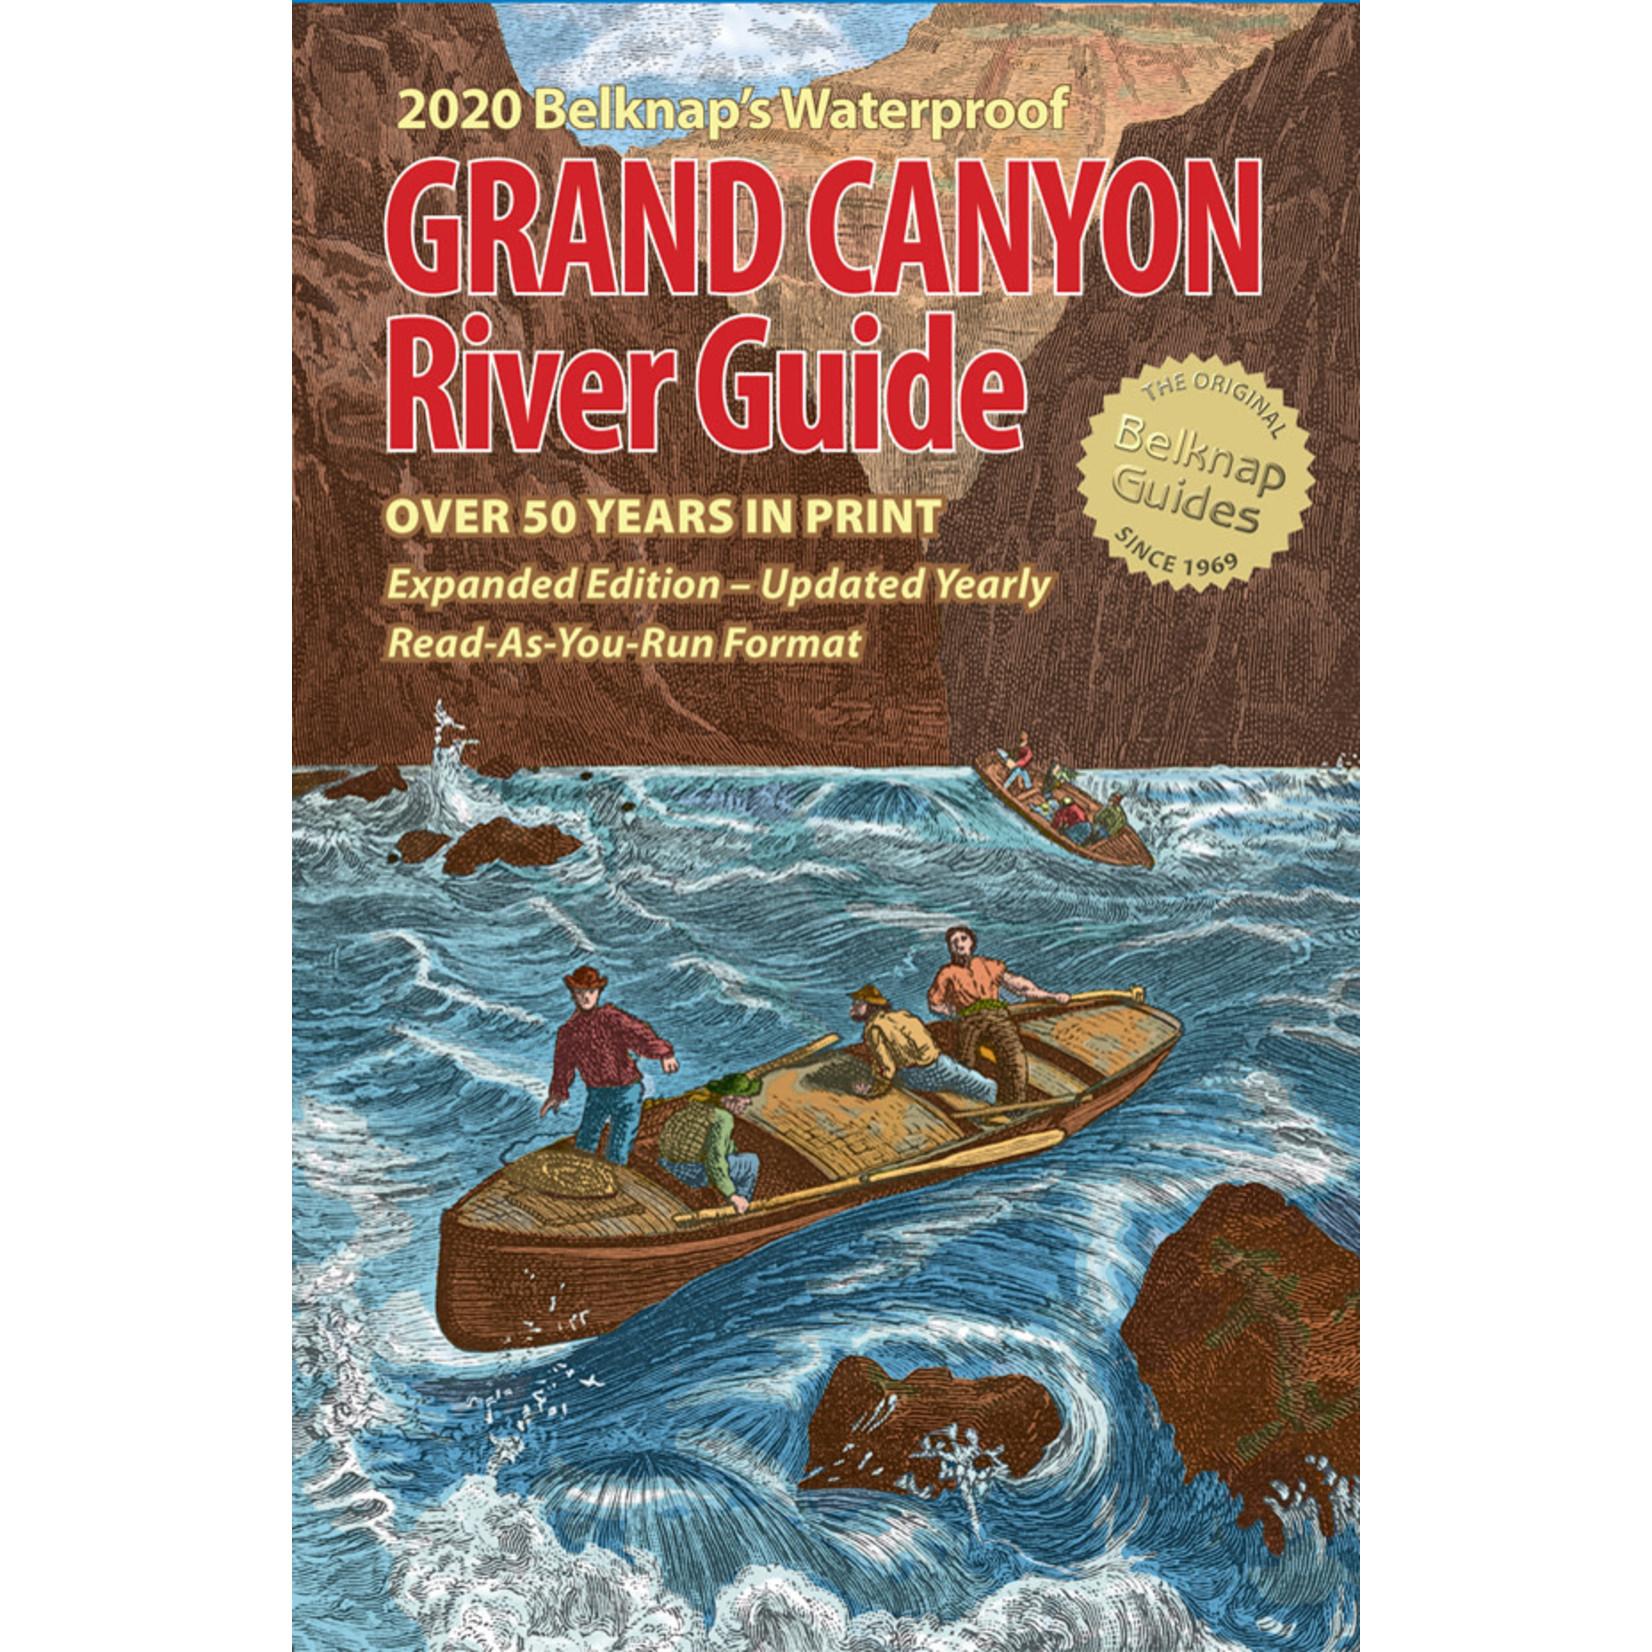 Belknap's Waterproof Grand Canyon River Guide